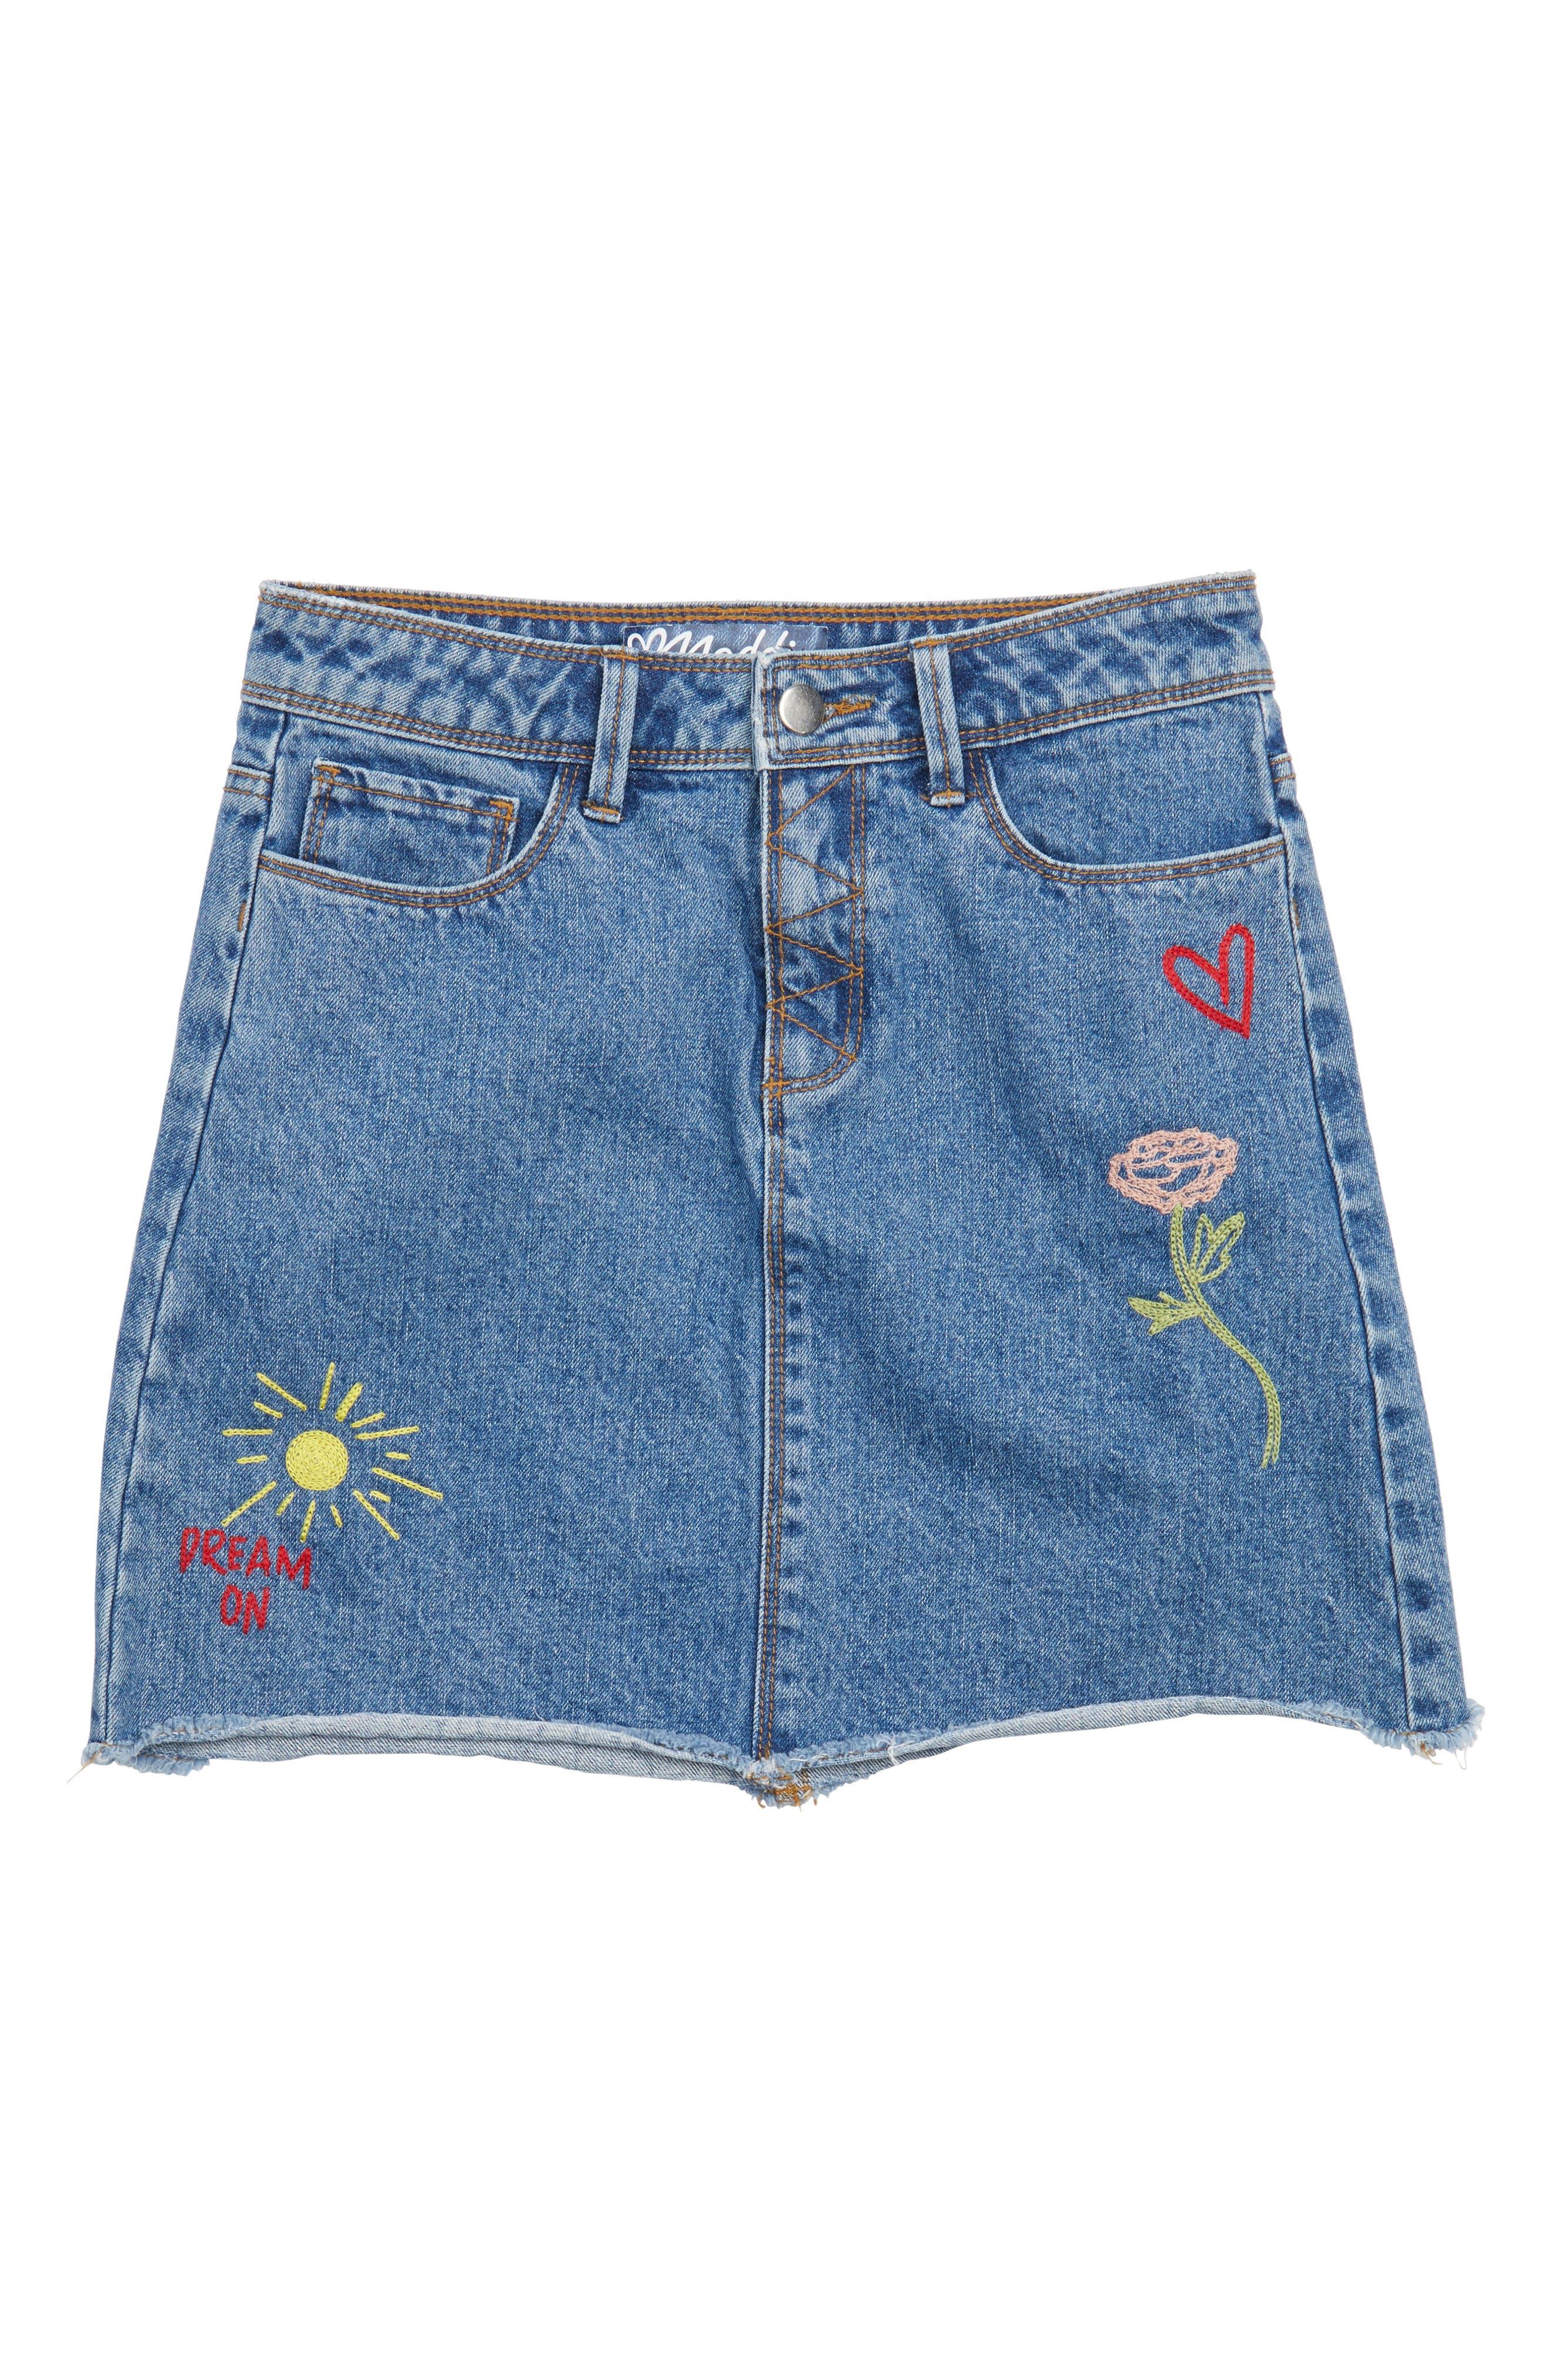 Embroidered Denim Skirt,                             Main thumbnail 1, color,                             487